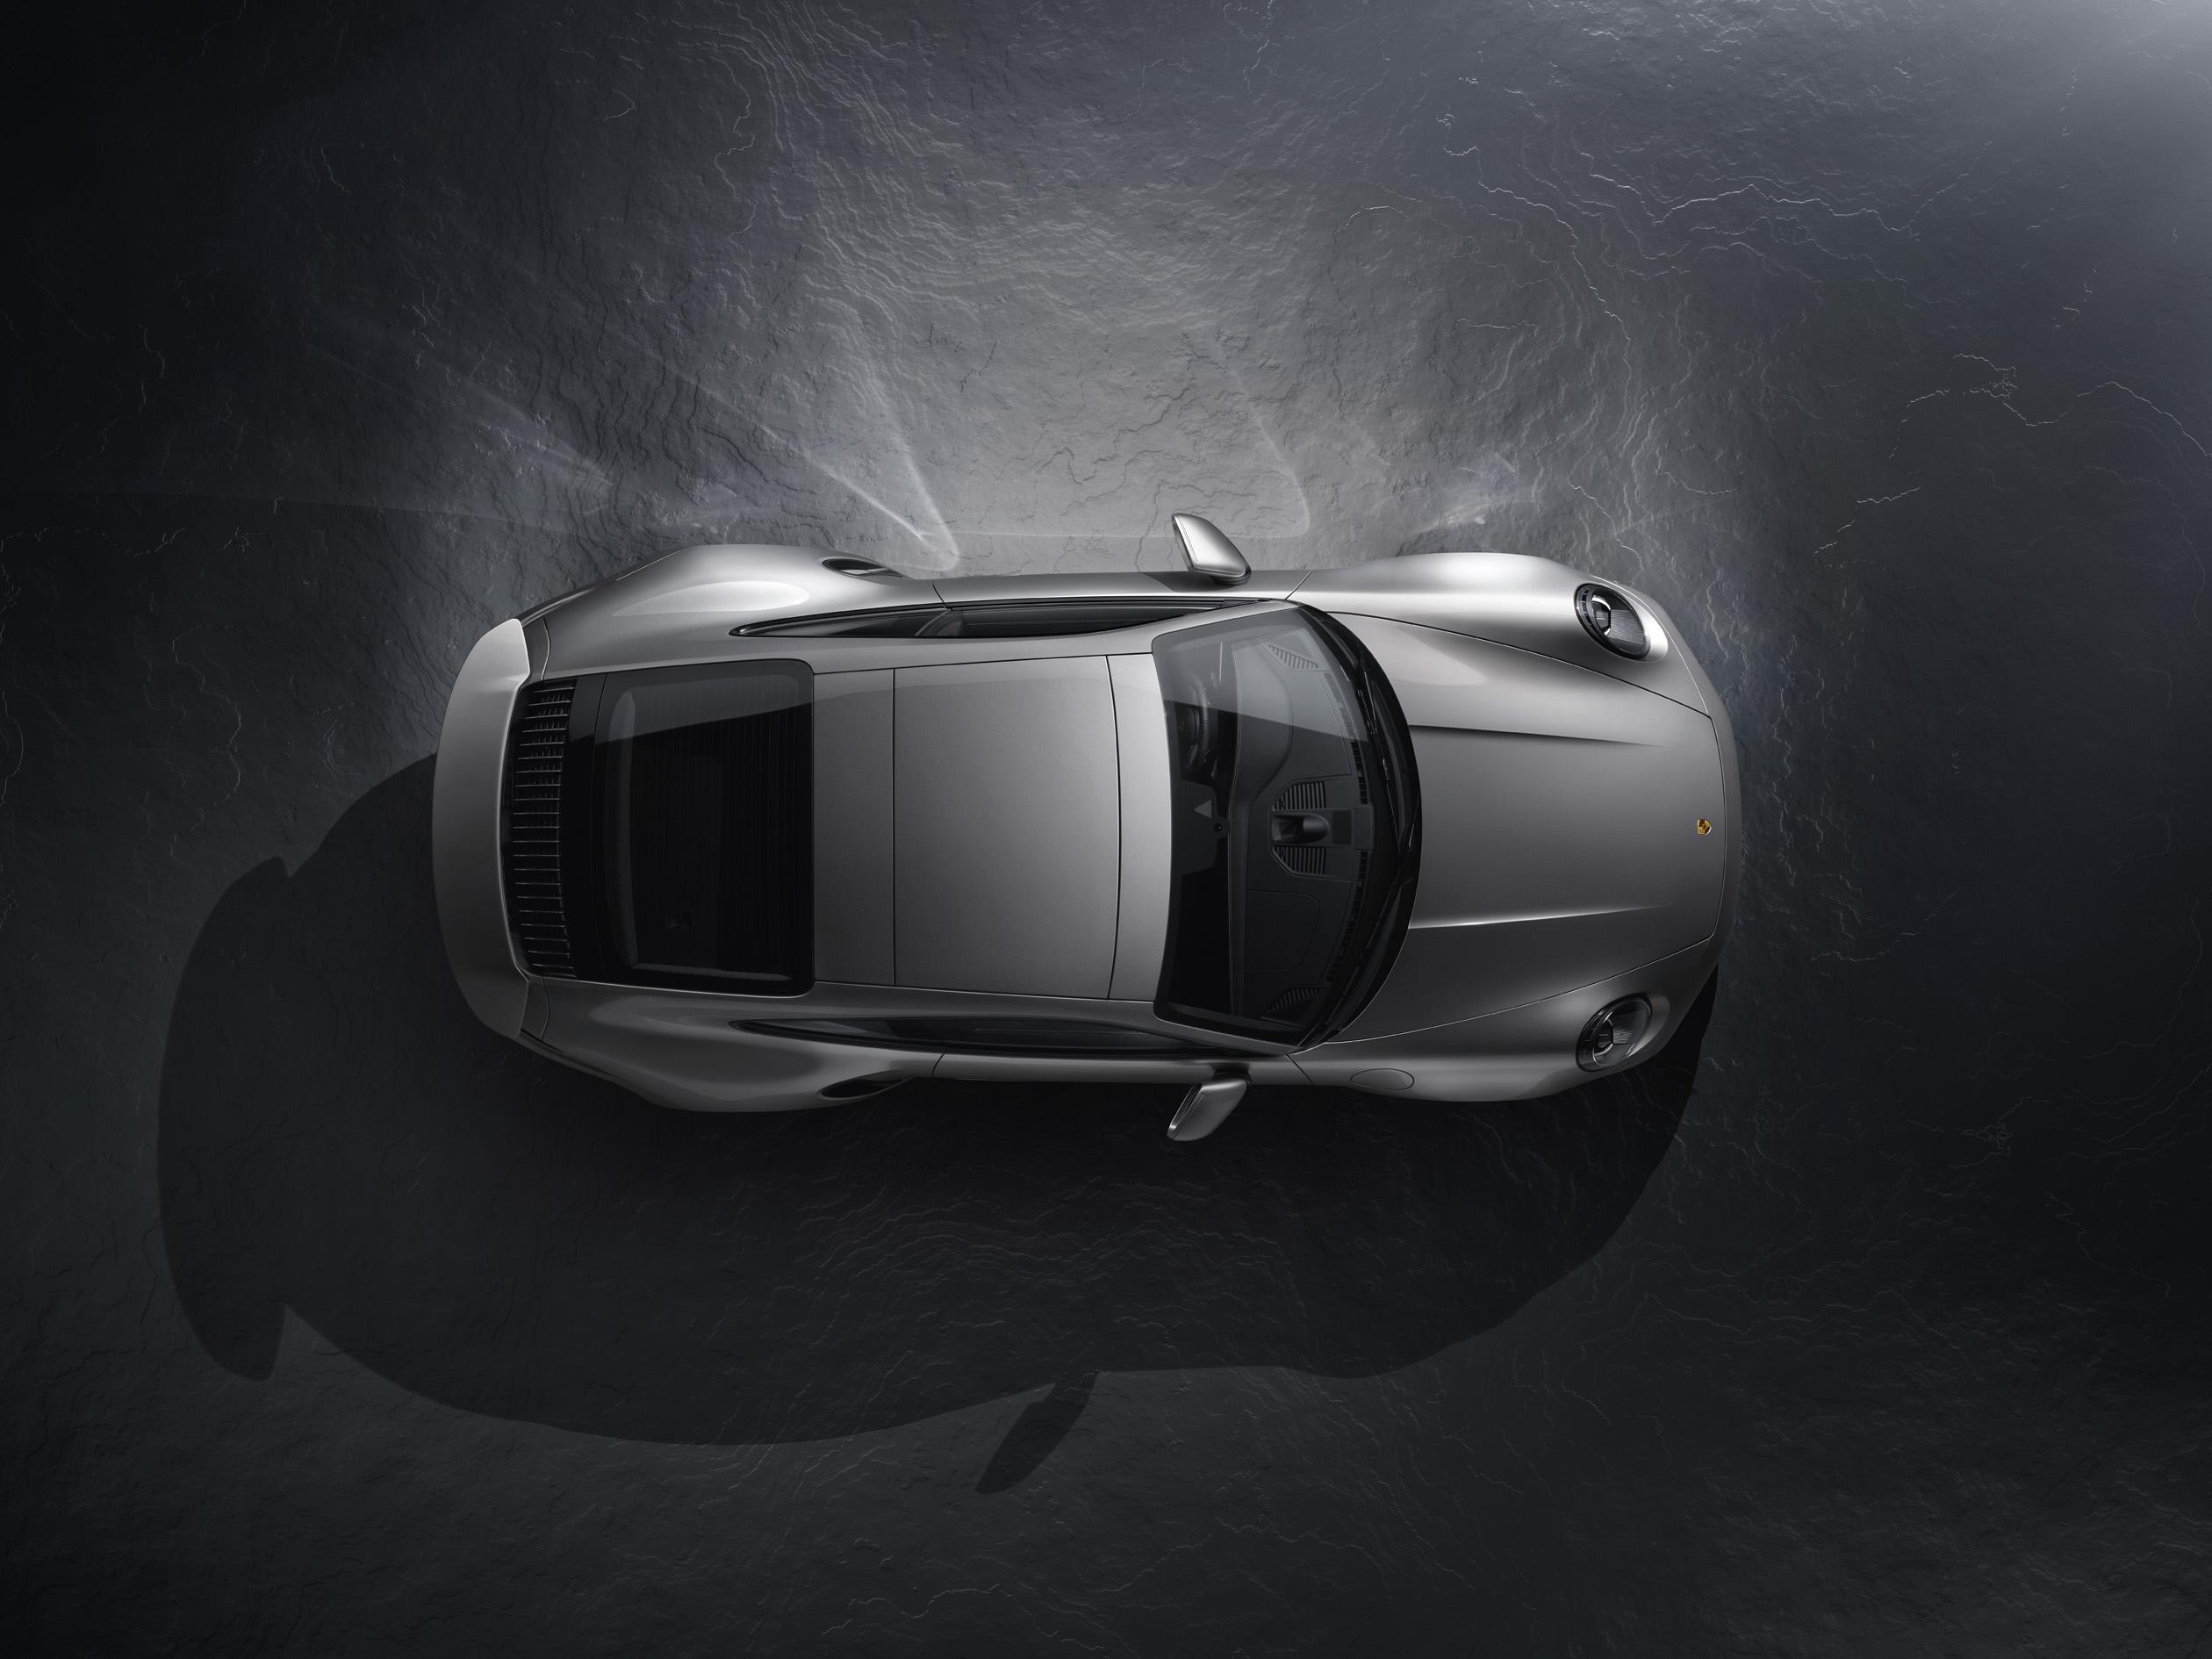 Porsche 911 Turbo S [5]